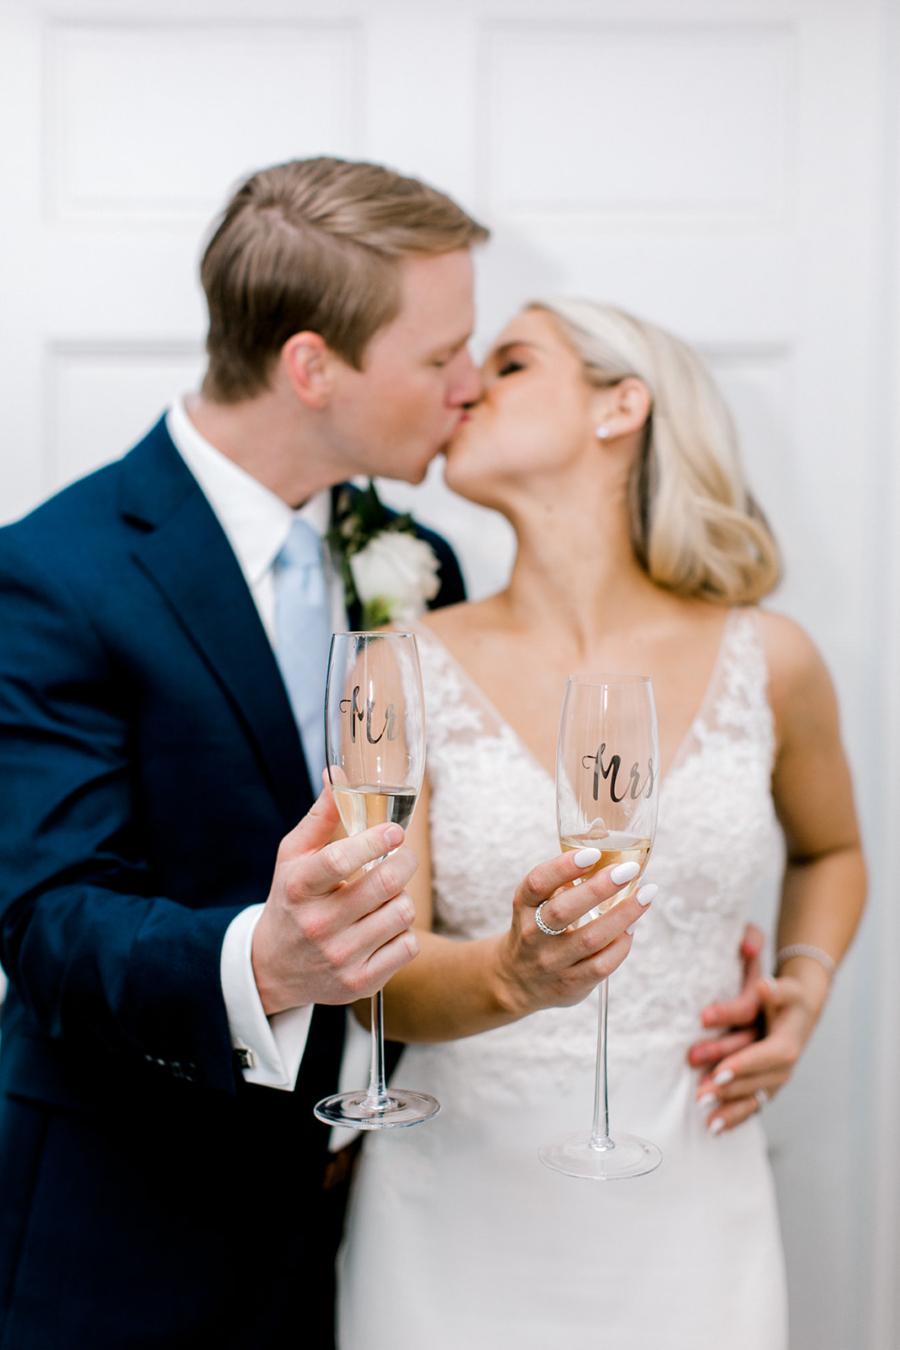 Mr and Mrs wedding champagne glasses